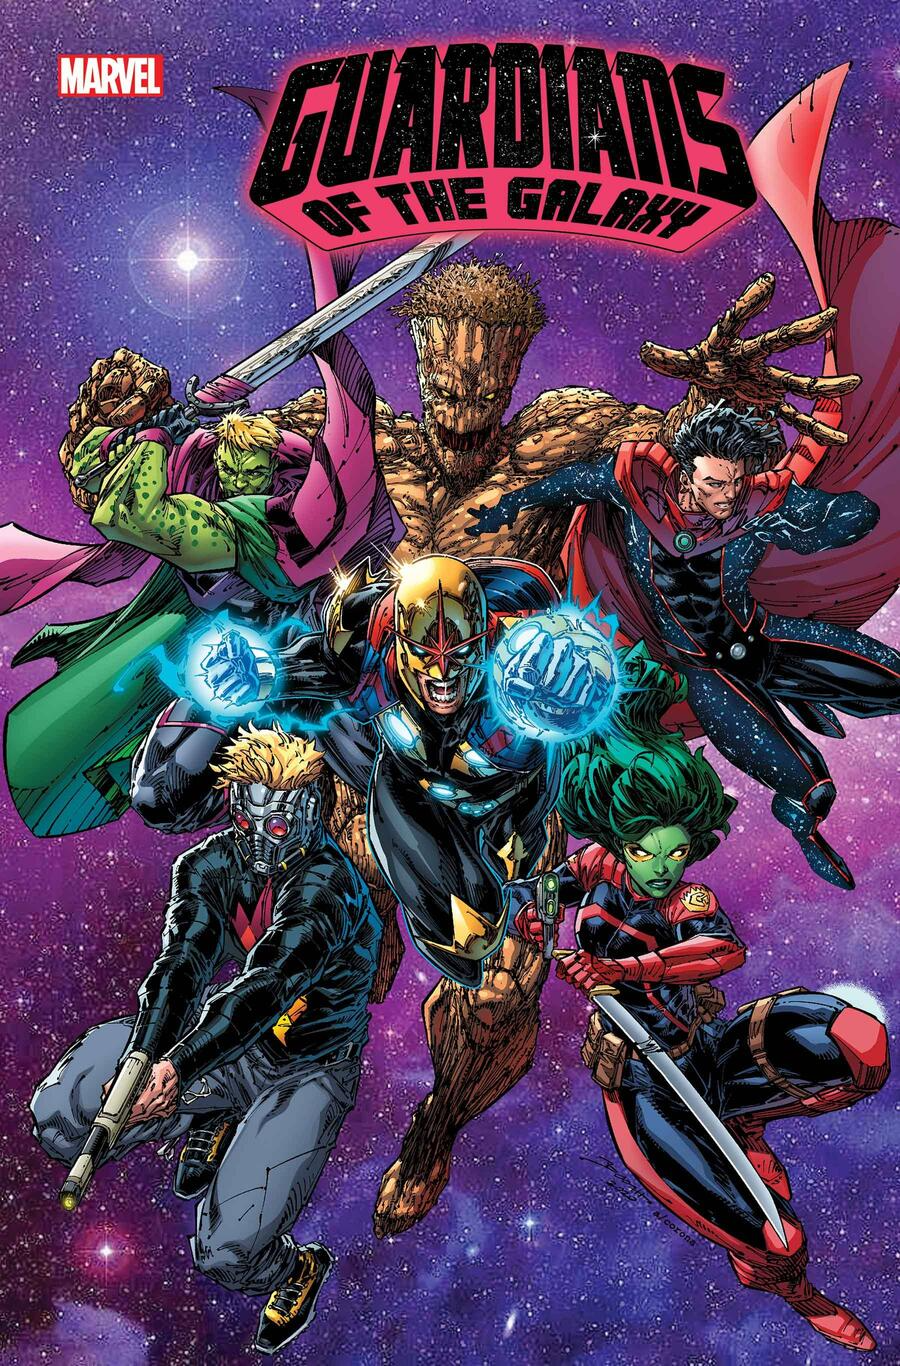 Guardians Of The Galaxy 13 Kicks Off Marvel S New Space Age Marvel In 2021 Guardians Of The Galaxy Marvel Comics